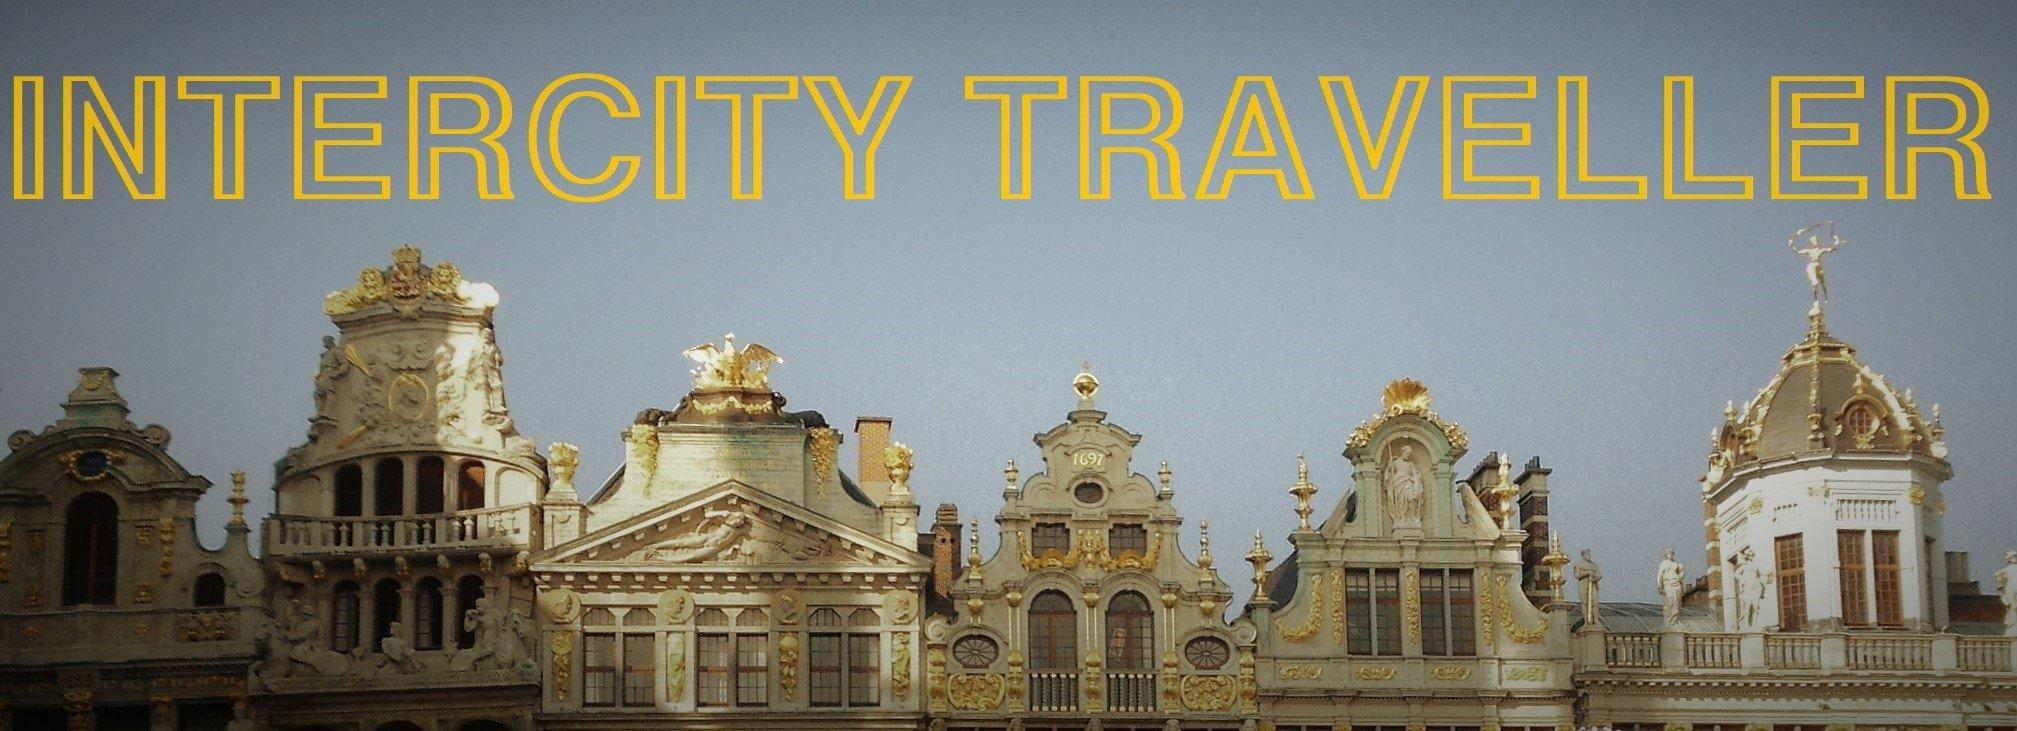 InterCity Traveller